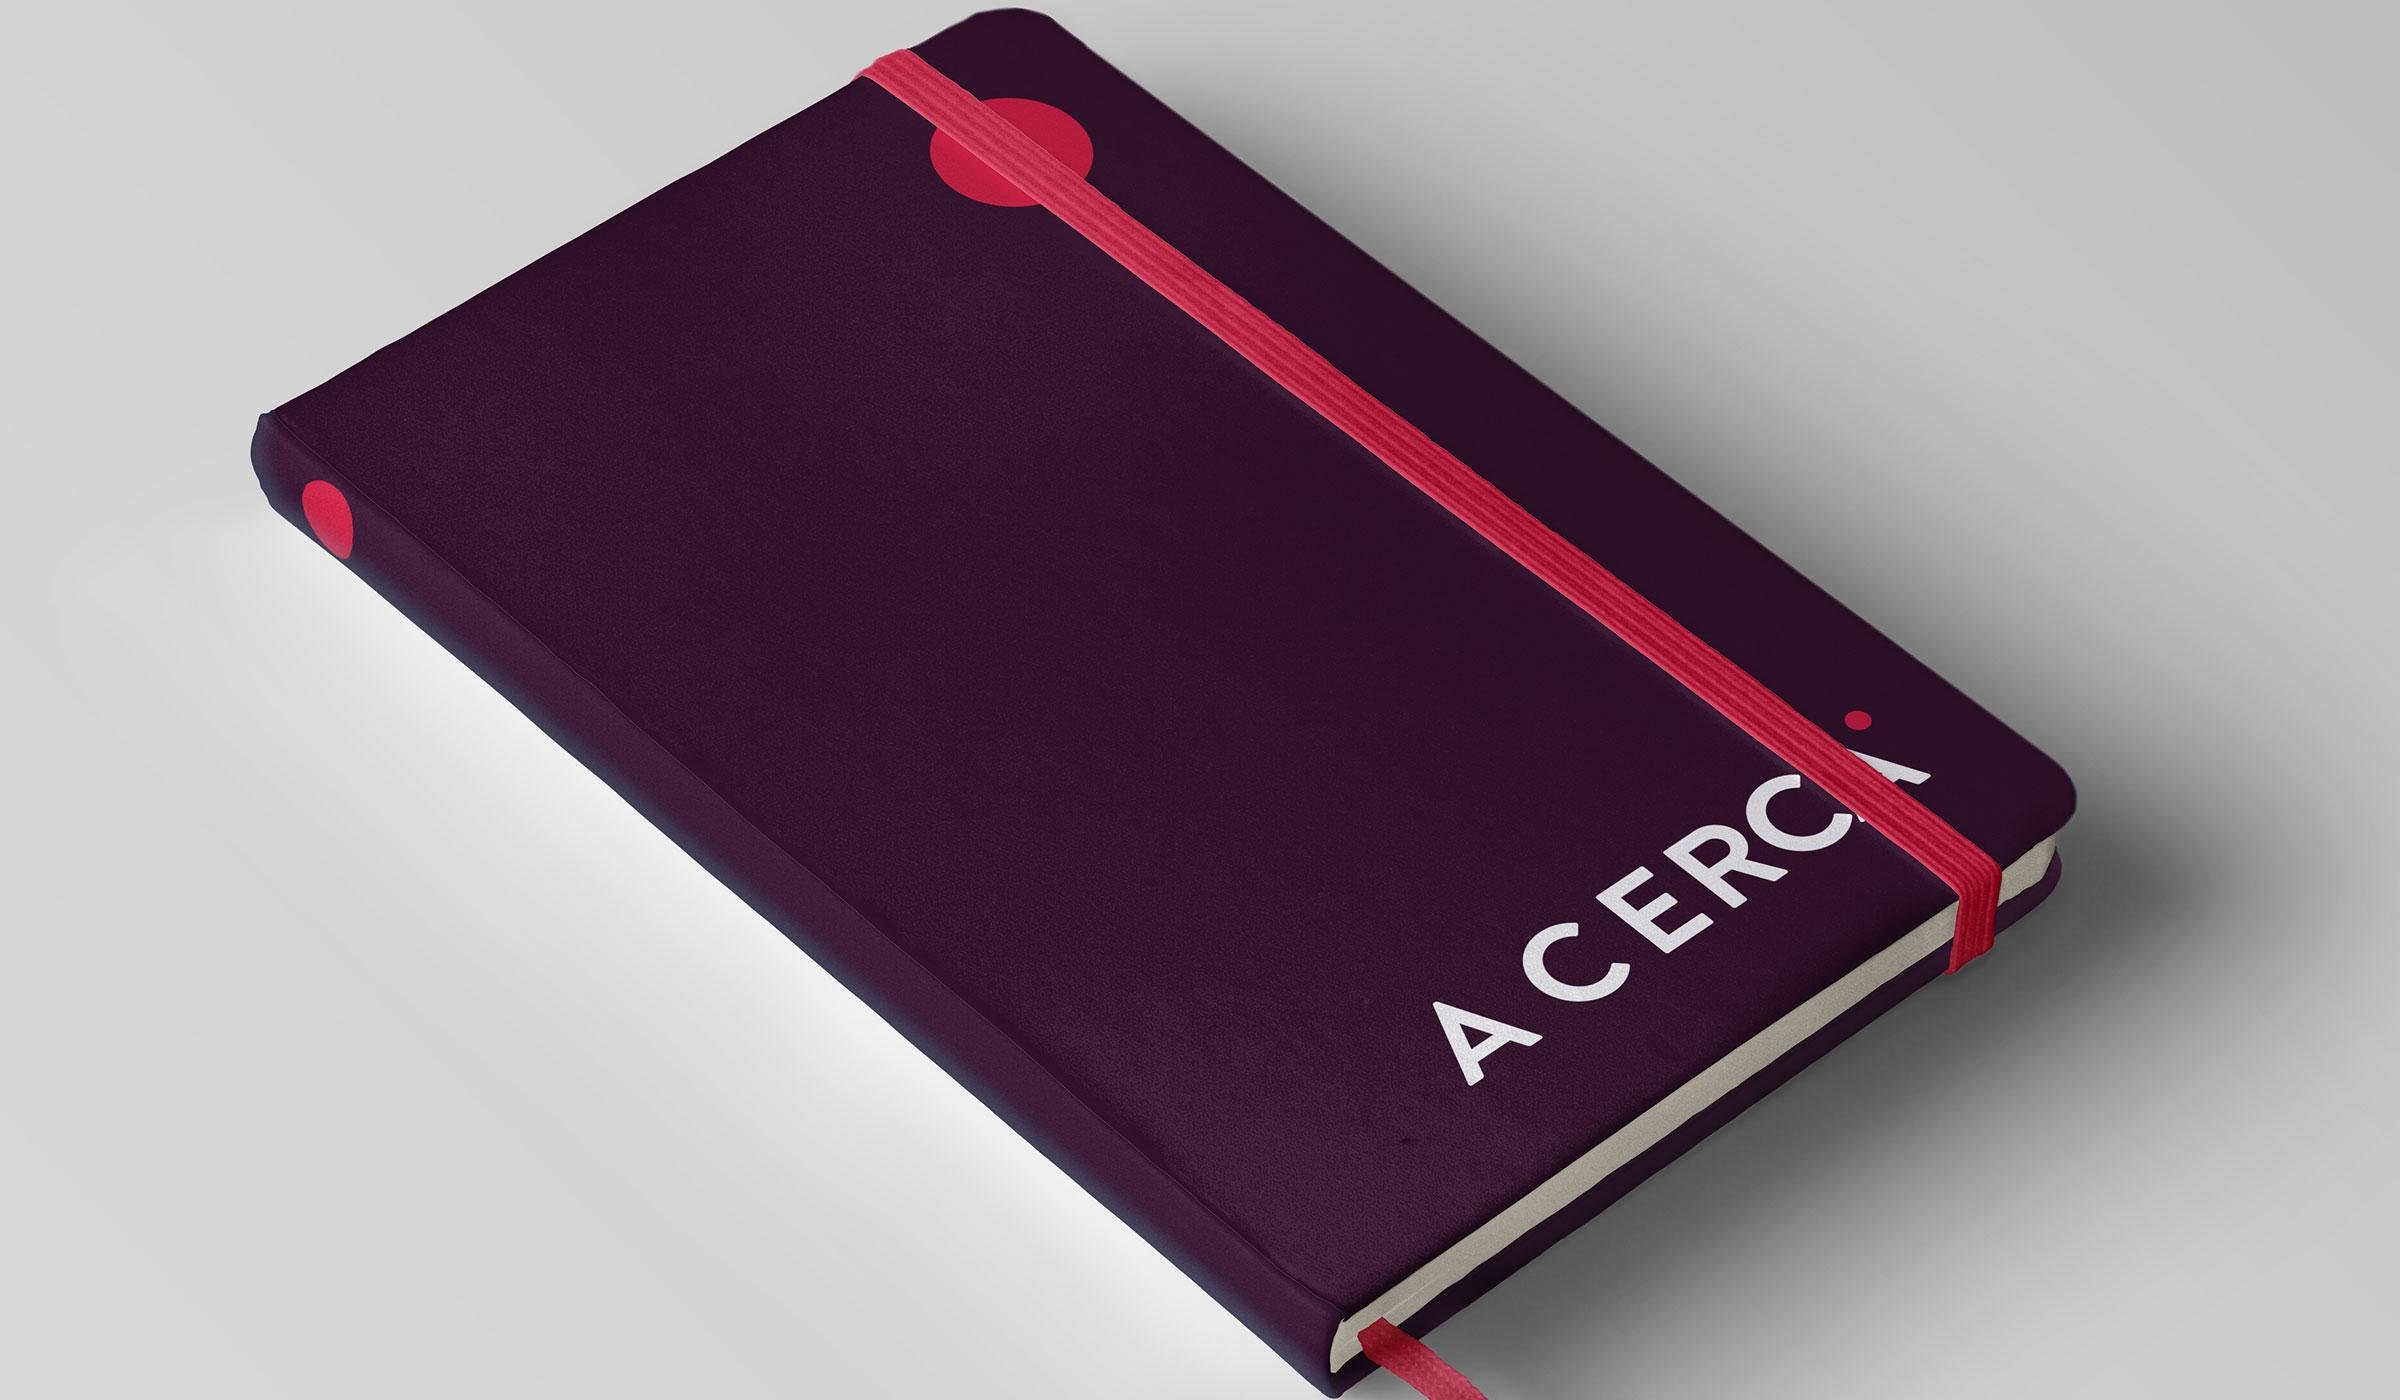 Acerca_Comunicaciones_Notebook.jpg